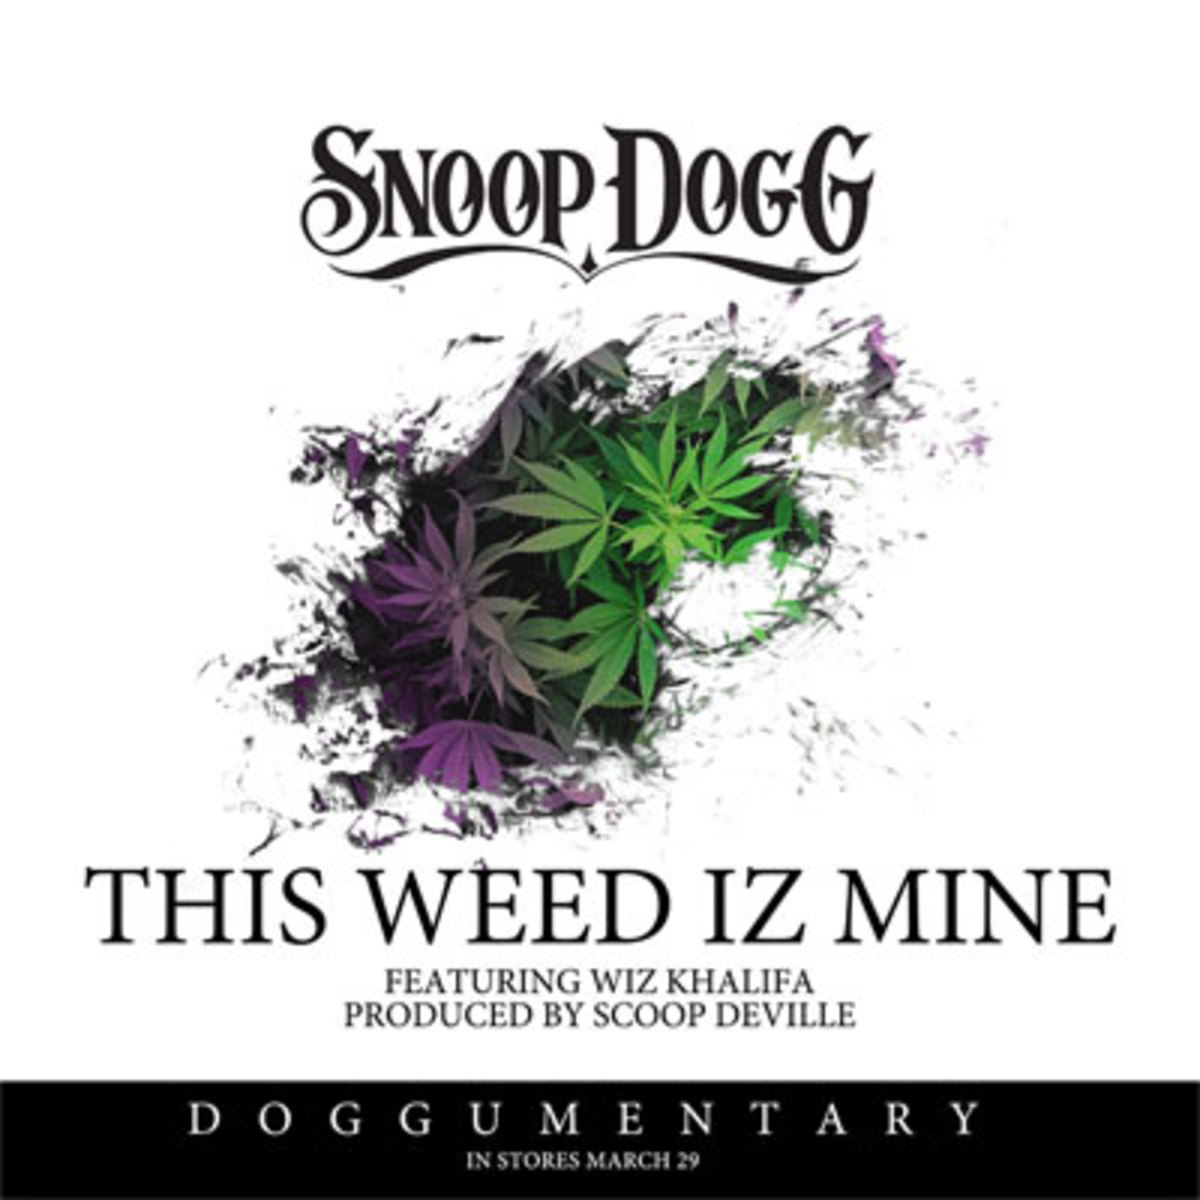 snoopdogg-theweedizmine.jpg